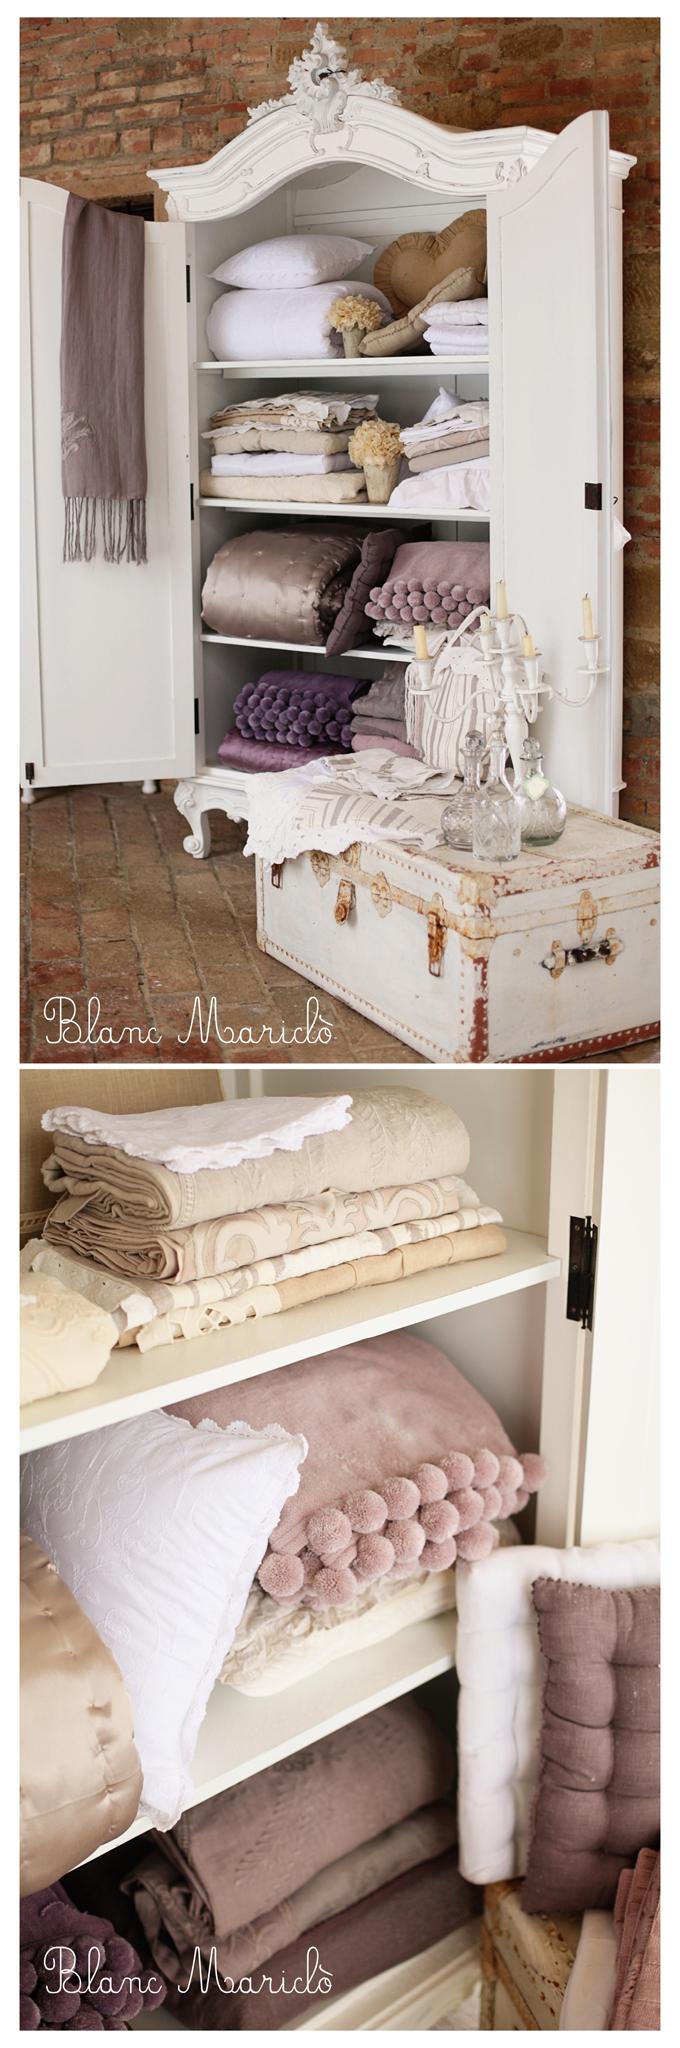 shabby abd chic home linen beautiful closet | Mobili | Pinterest ...